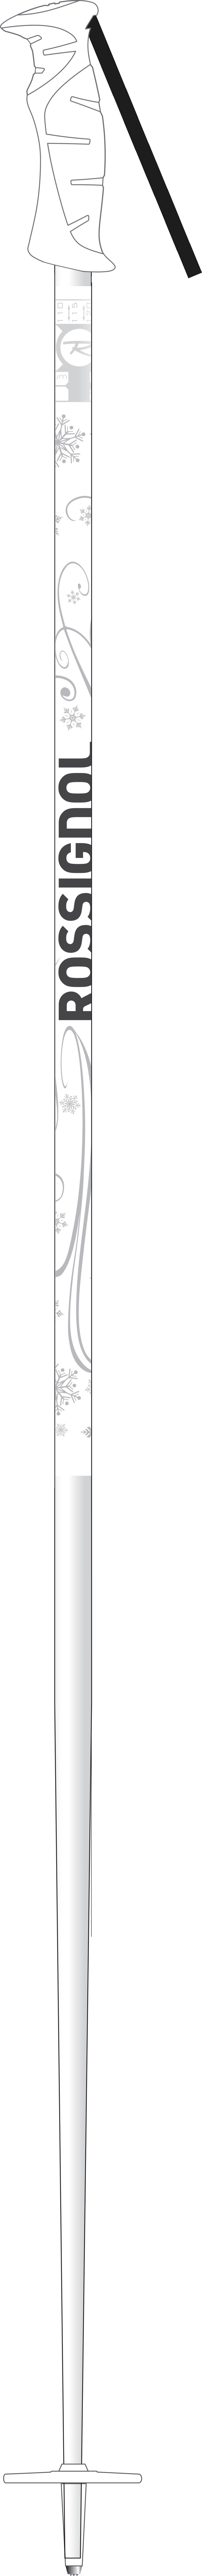 Rossignol Snow Damenschuhe Flake Ski Poles Damenschuhe Snow Sz 115cm (46in) f20113